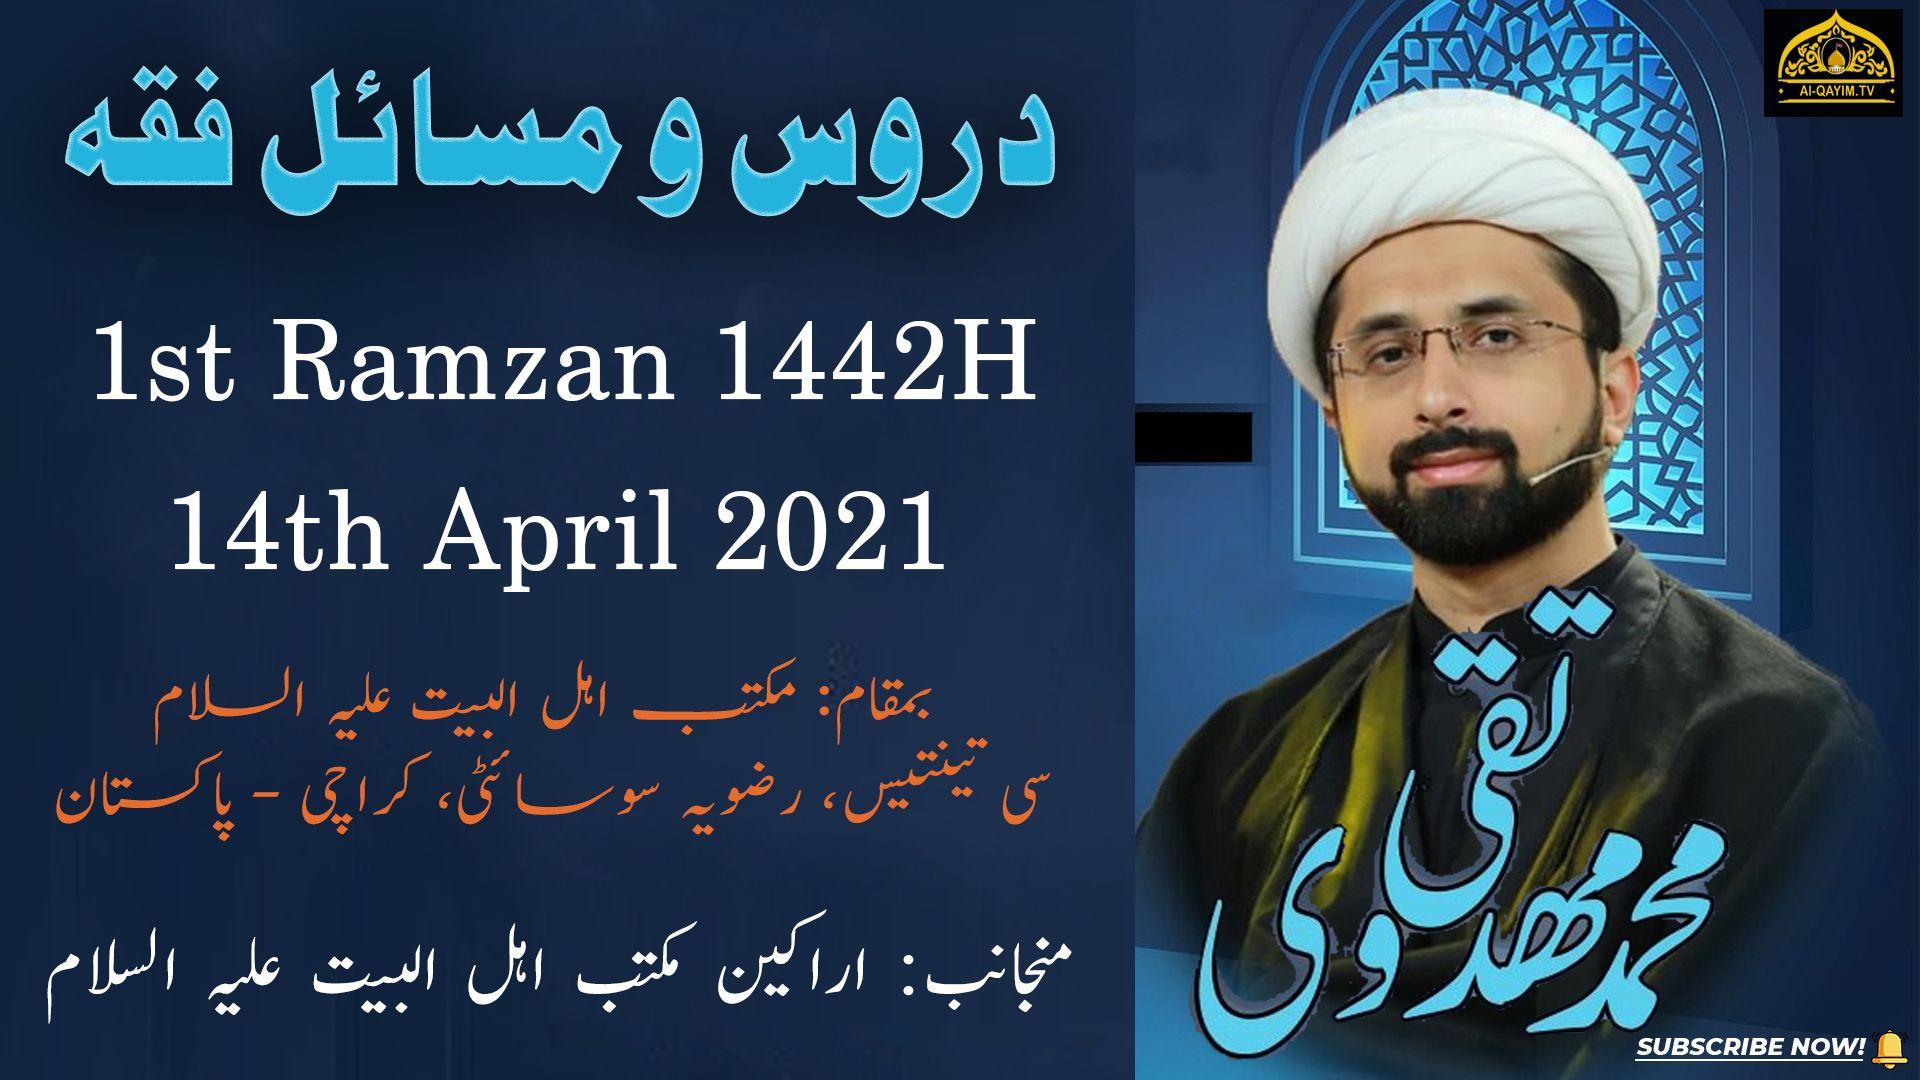 Moulana Muhammad Taqi Mehdavi | Dars Wo Masail Fiqae | 1st Ramzan 2021 | Maktab-e-Ahlebait - Karachi